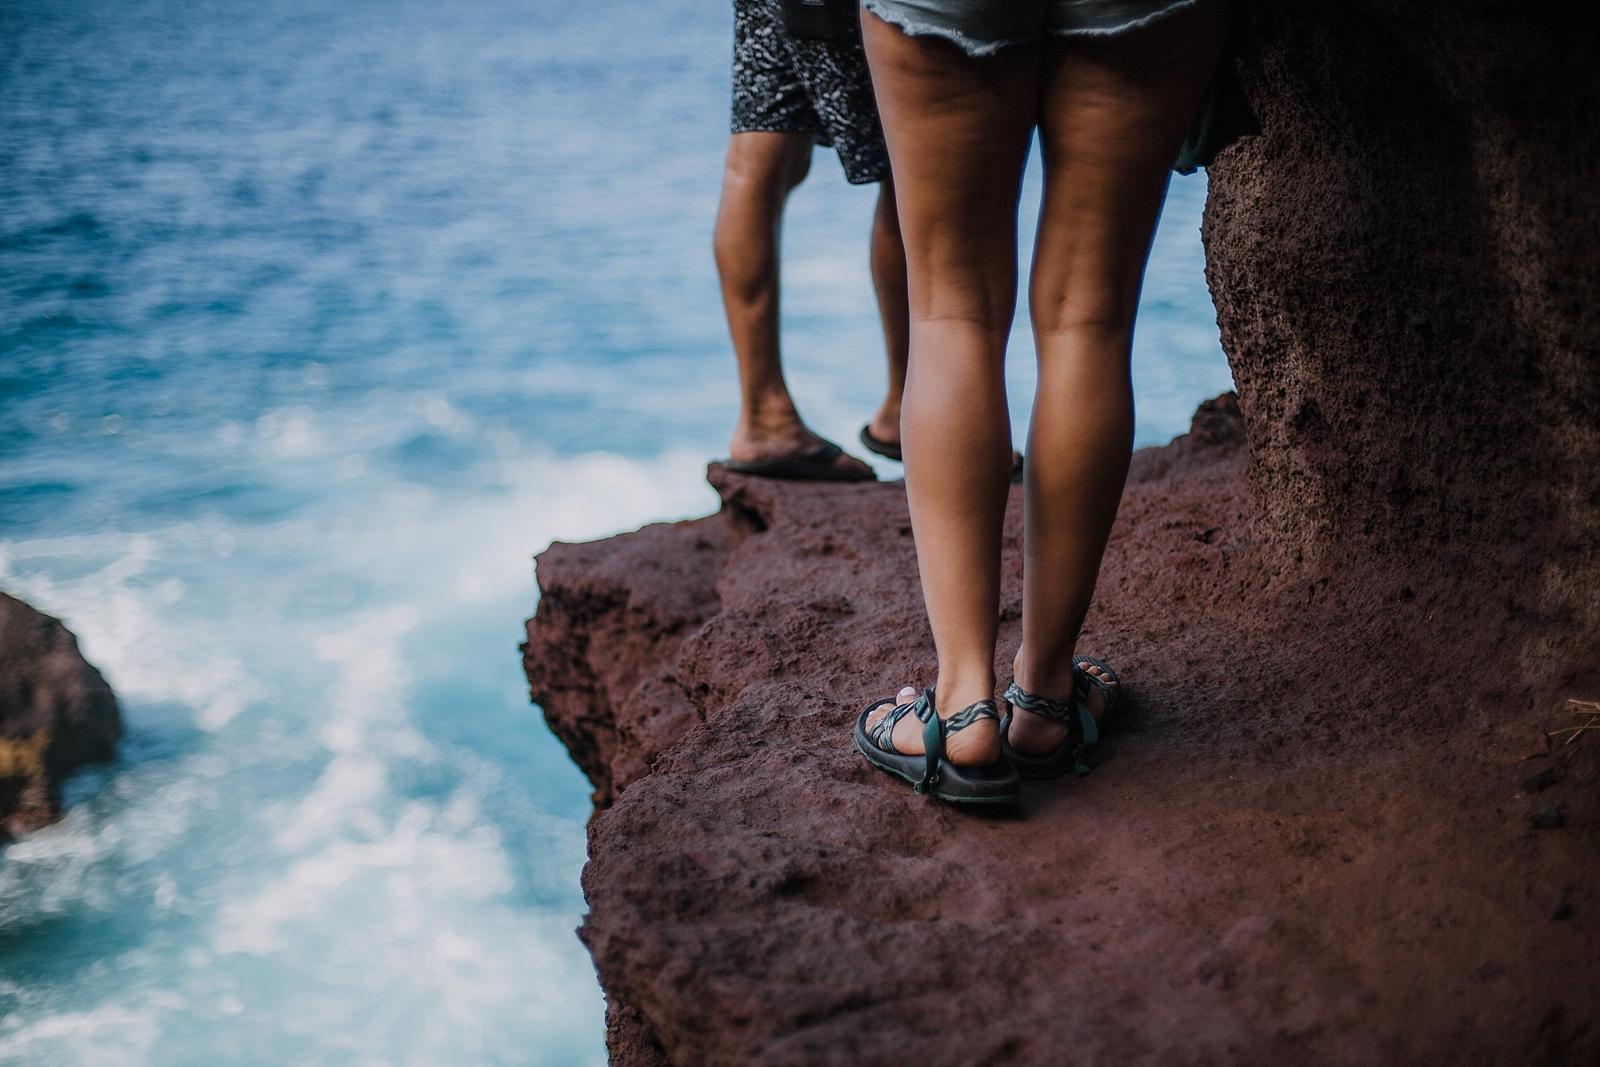 climbing in maui, maui cliffside, maui climbing, maui elopement photographer, maui wedding photographer, couple on cliffside, maui hiking, maui hawaii hiking, maui tide pool, alexis russell ring